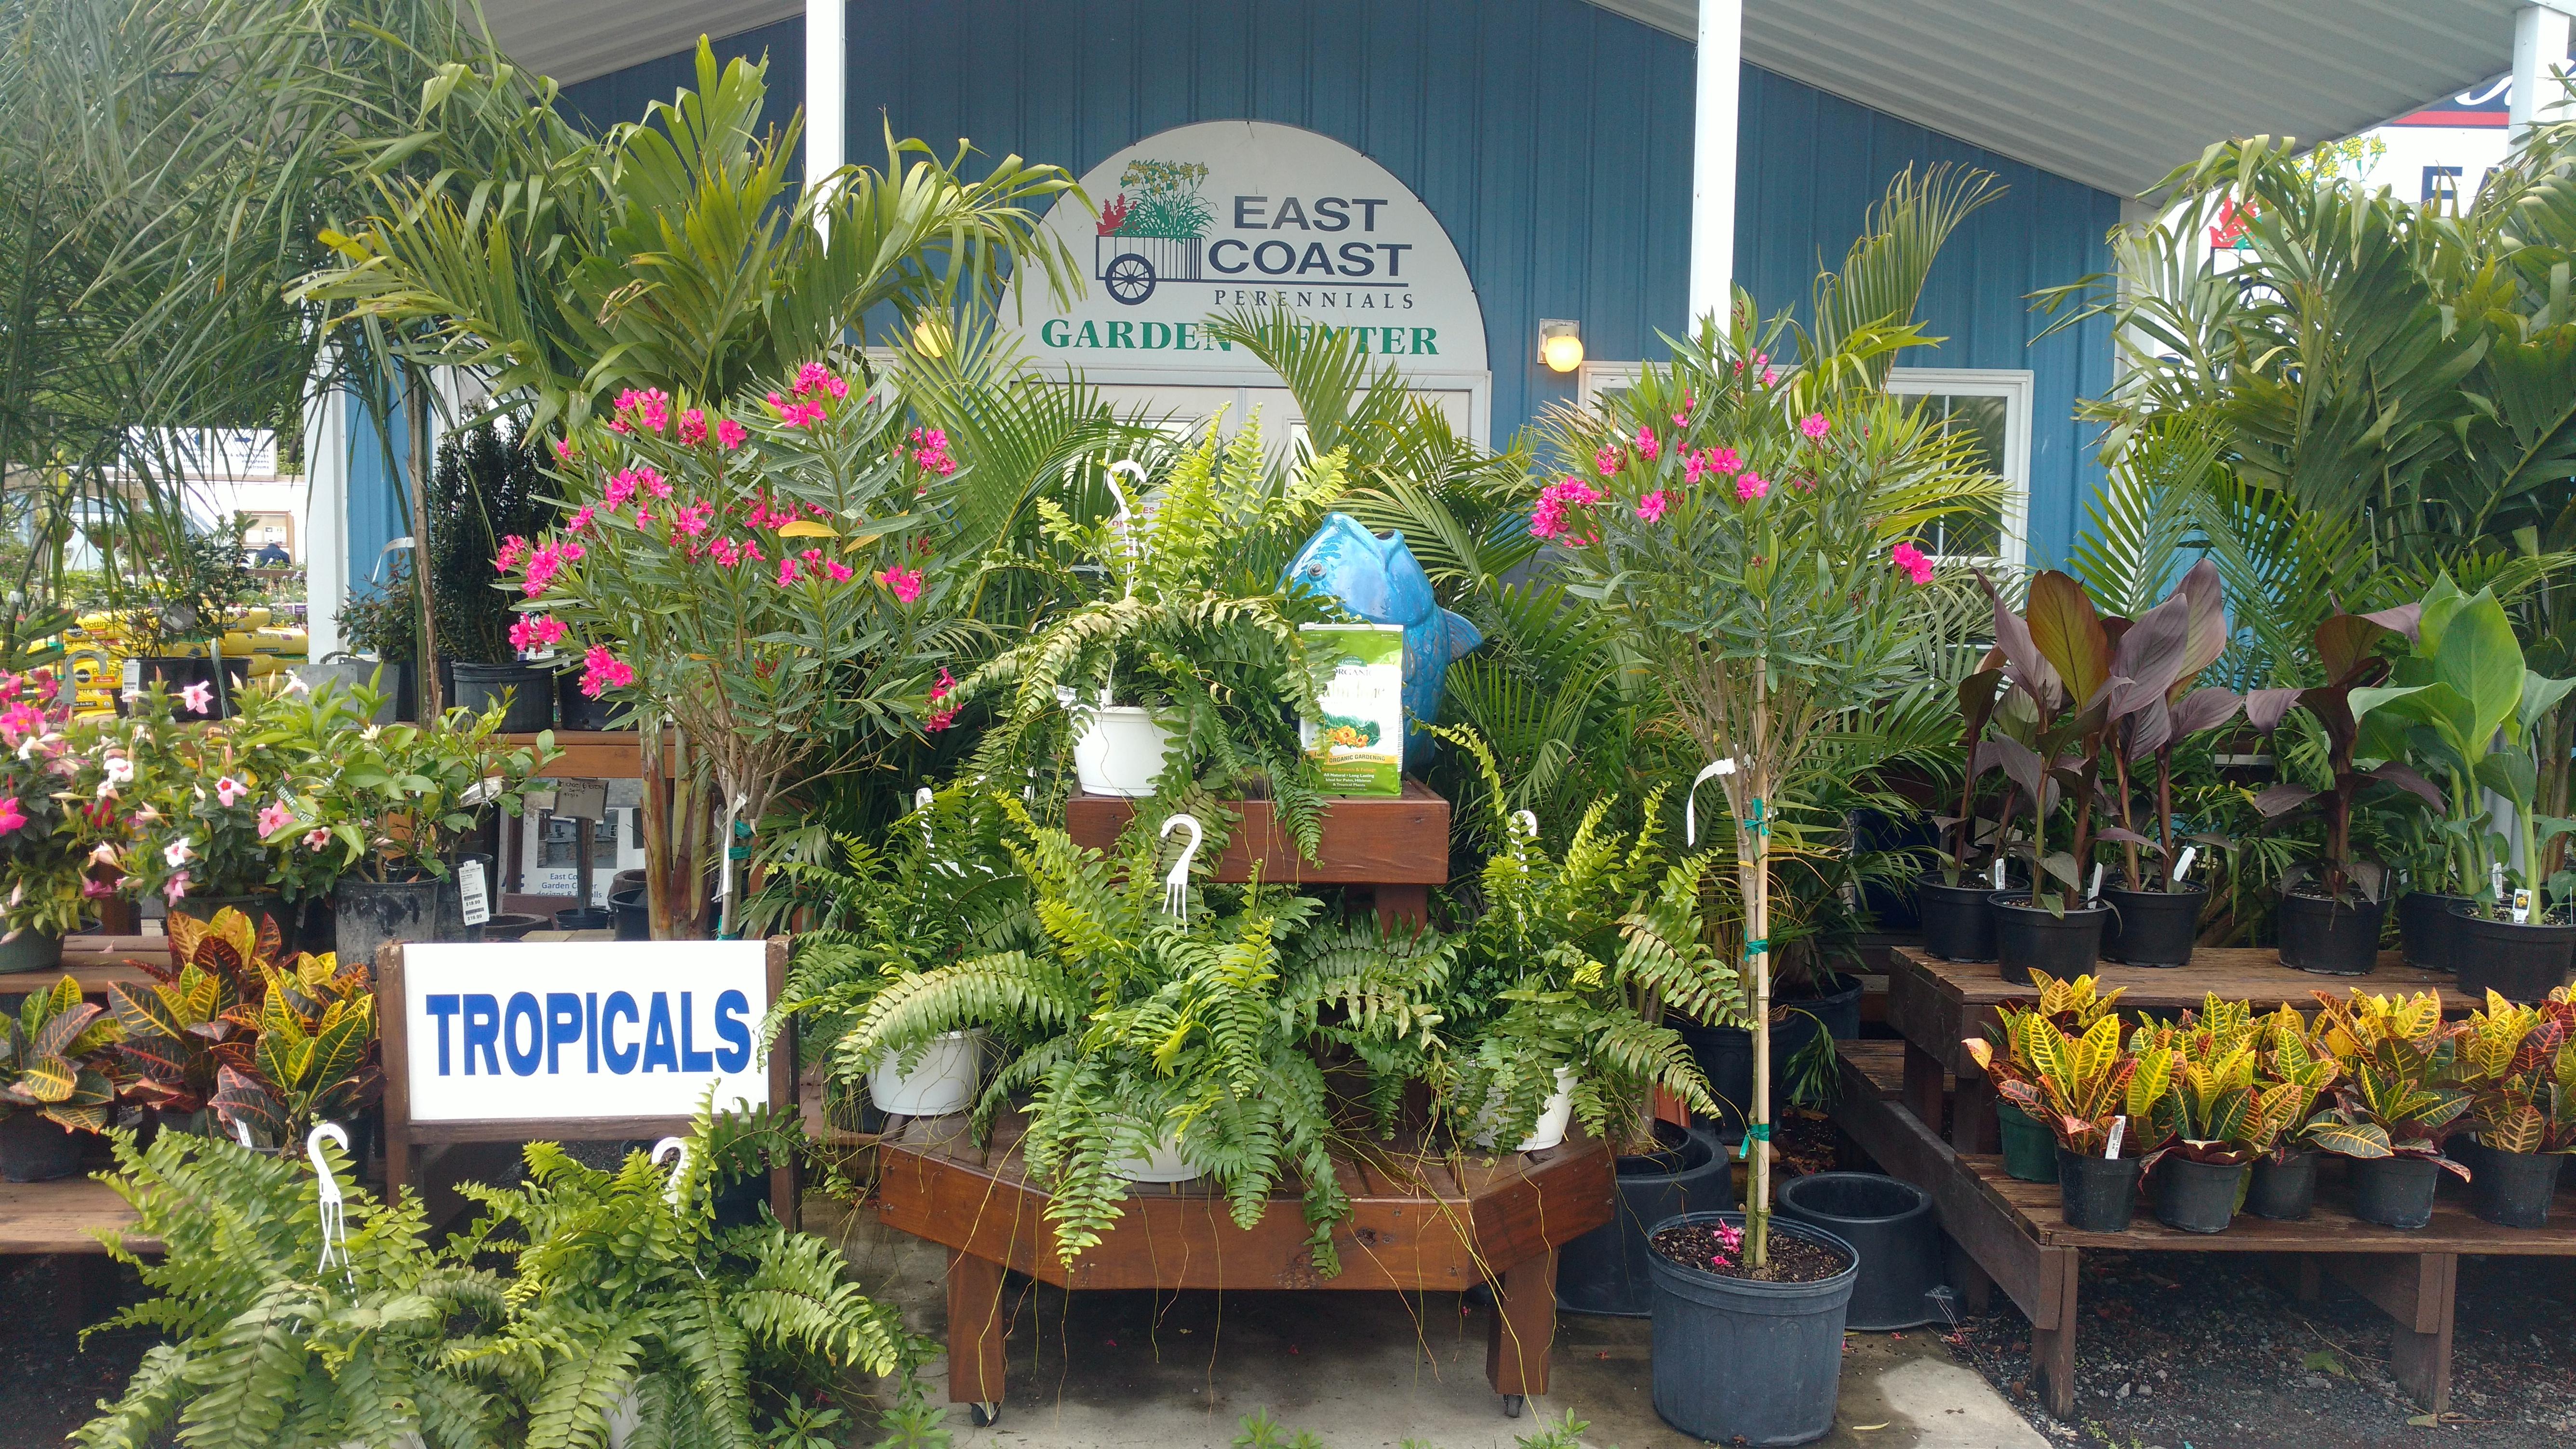 Tropical Plant Workshop on 5/25